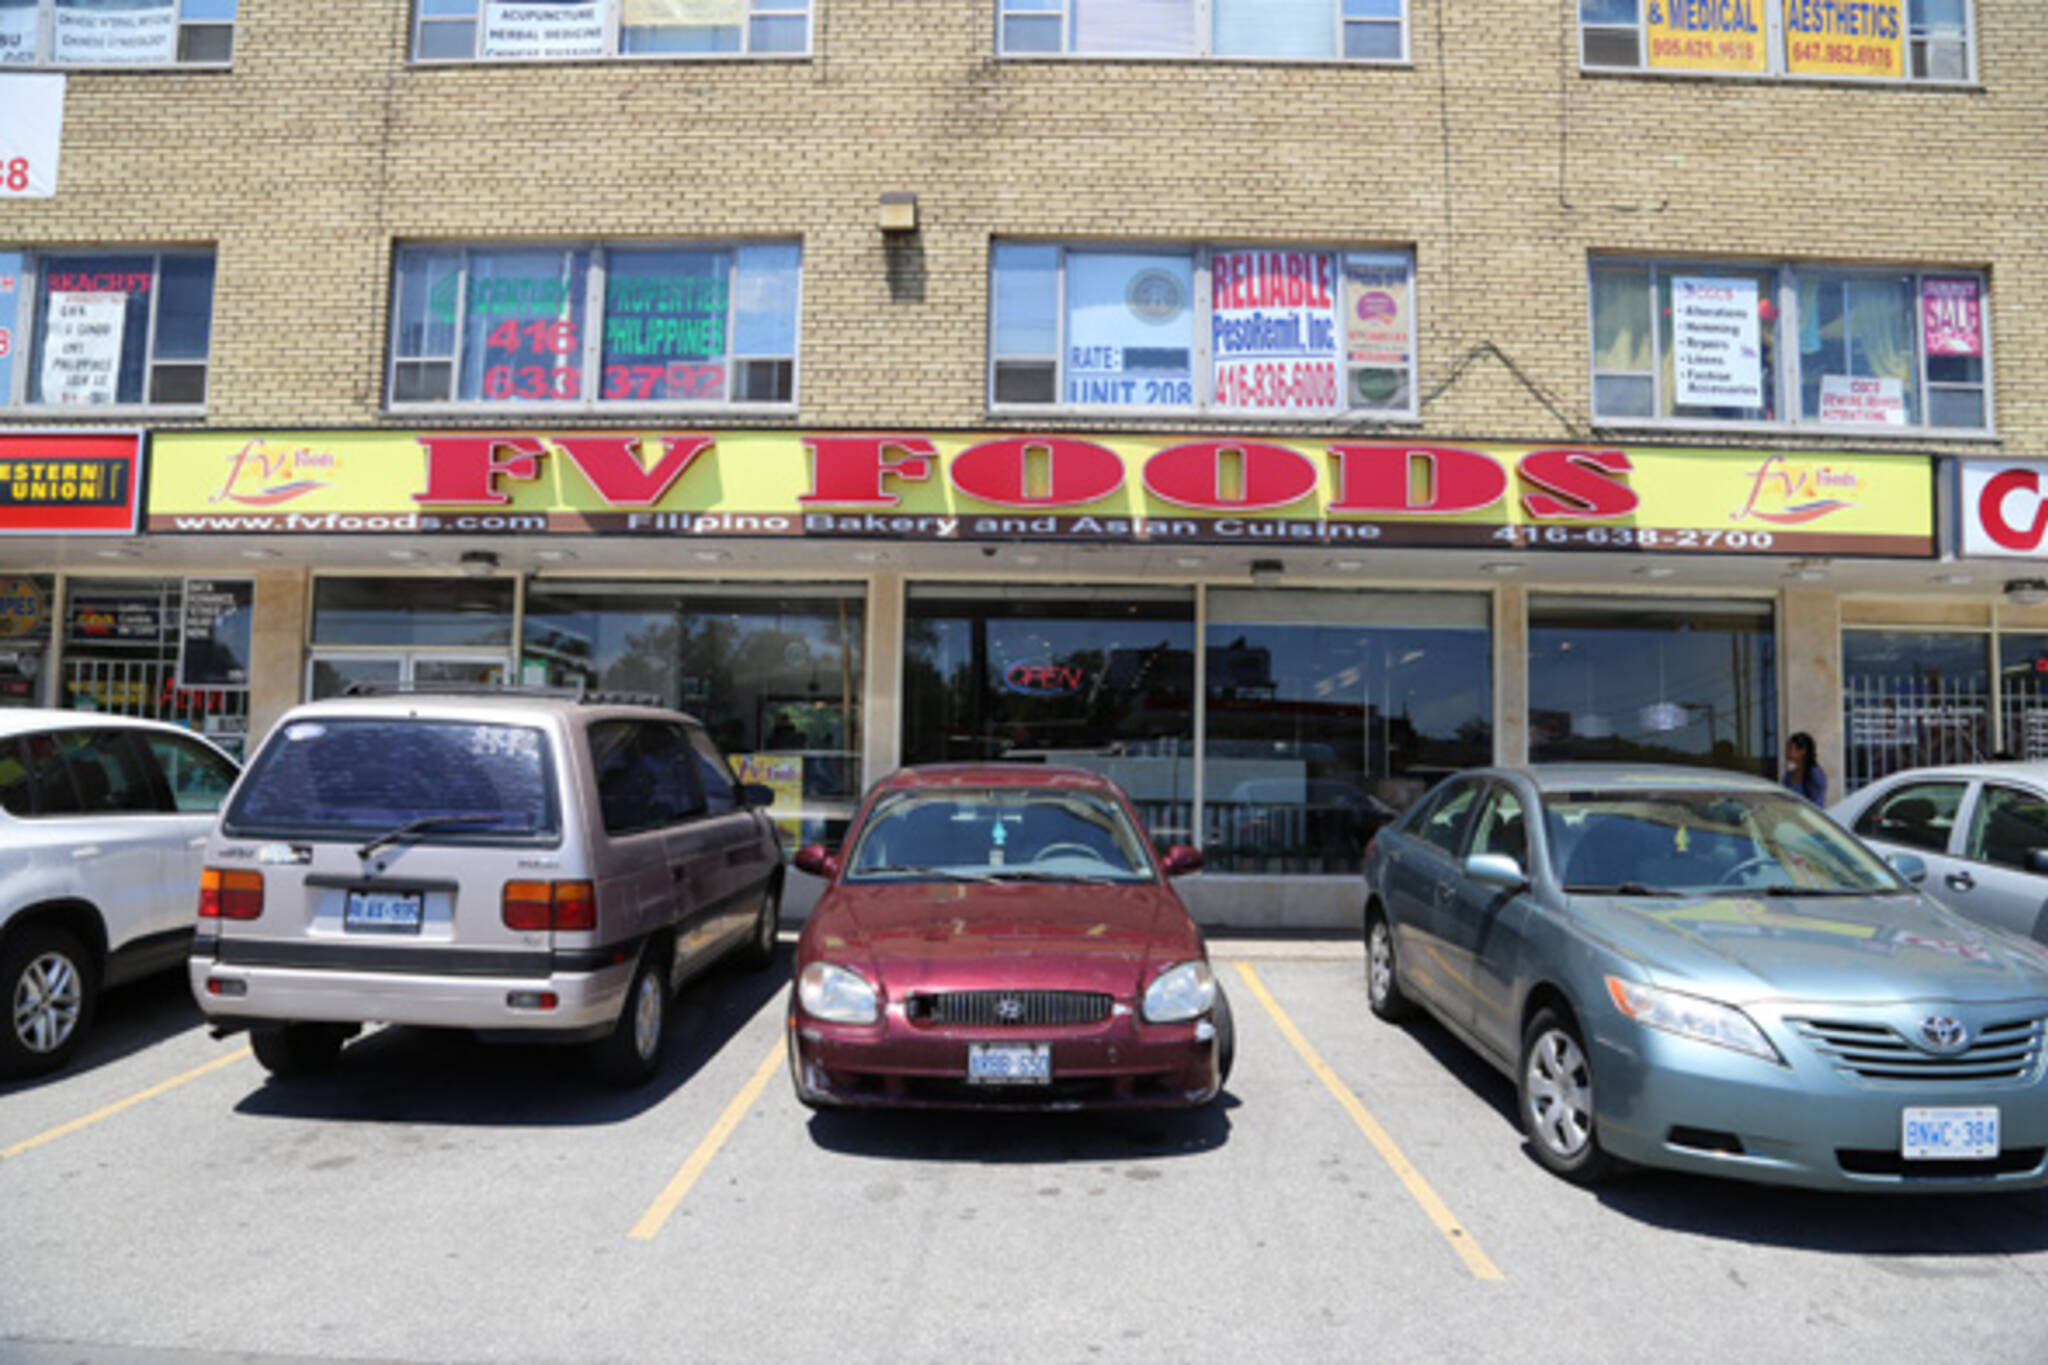 FV Foods Wilson Avenue Toronto